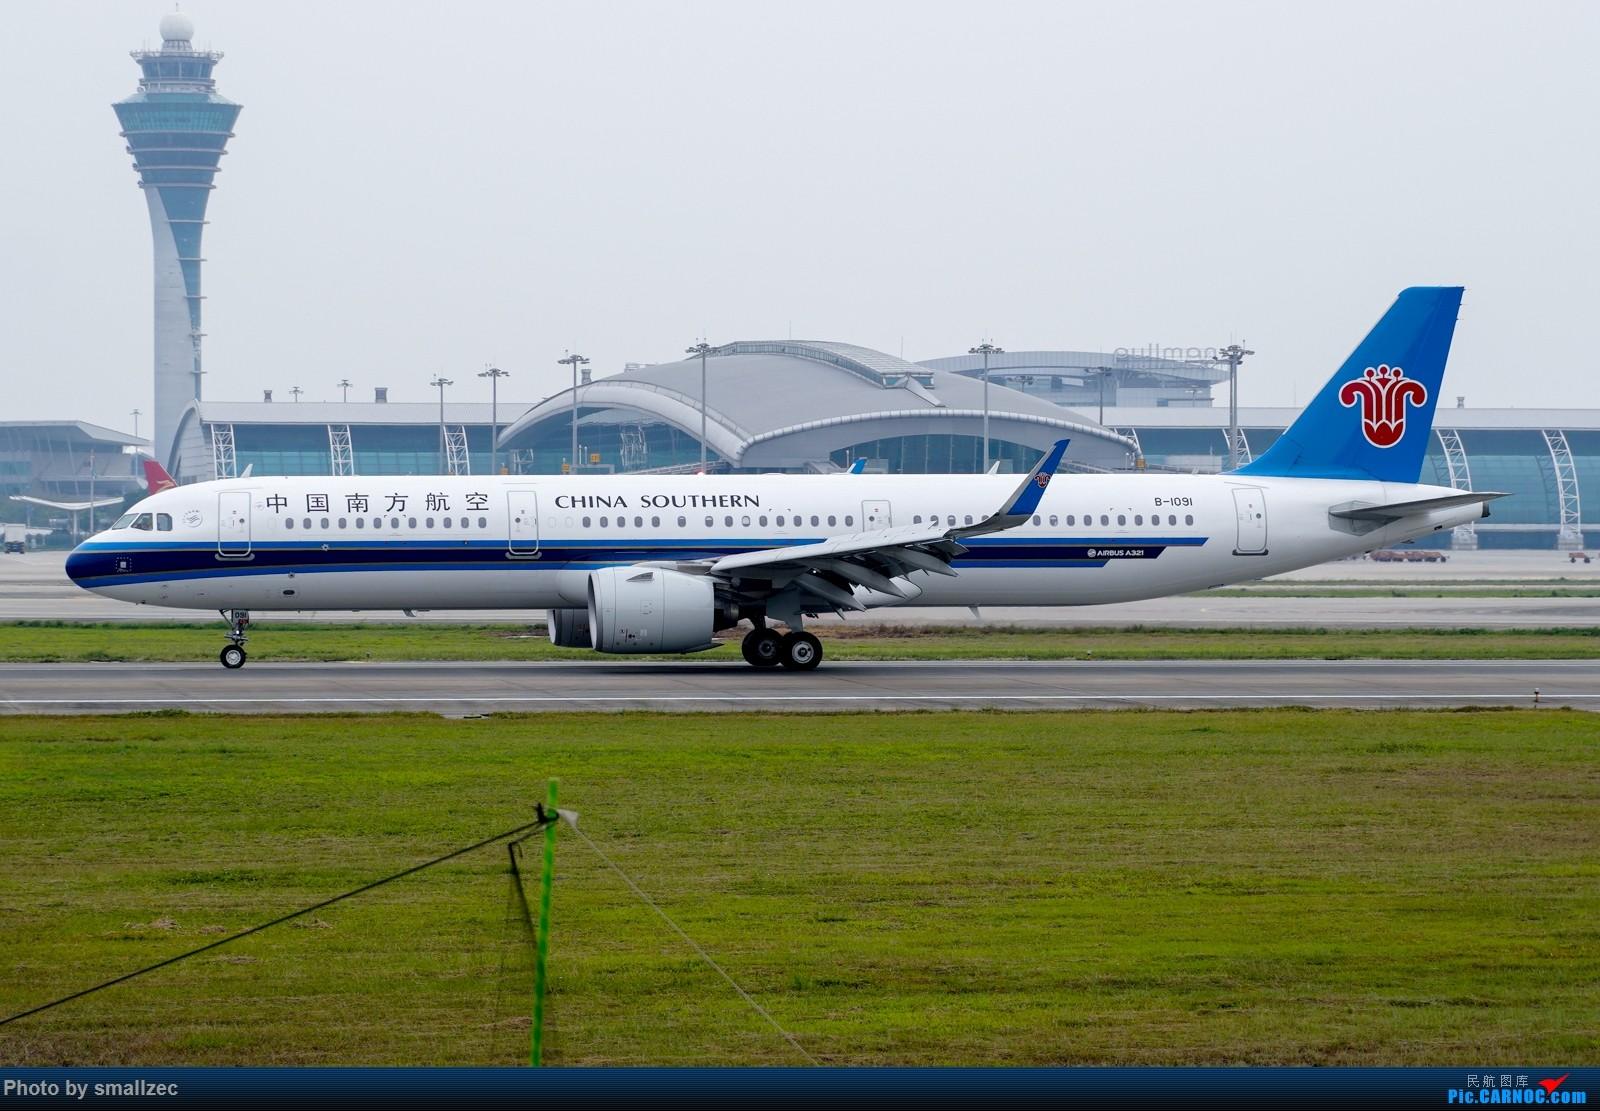 Re:[原创]难得休假,CAN一顿乱拍,顺带试试新镜头 AIRBUS A321NEO B-1091 广州白云国际机场